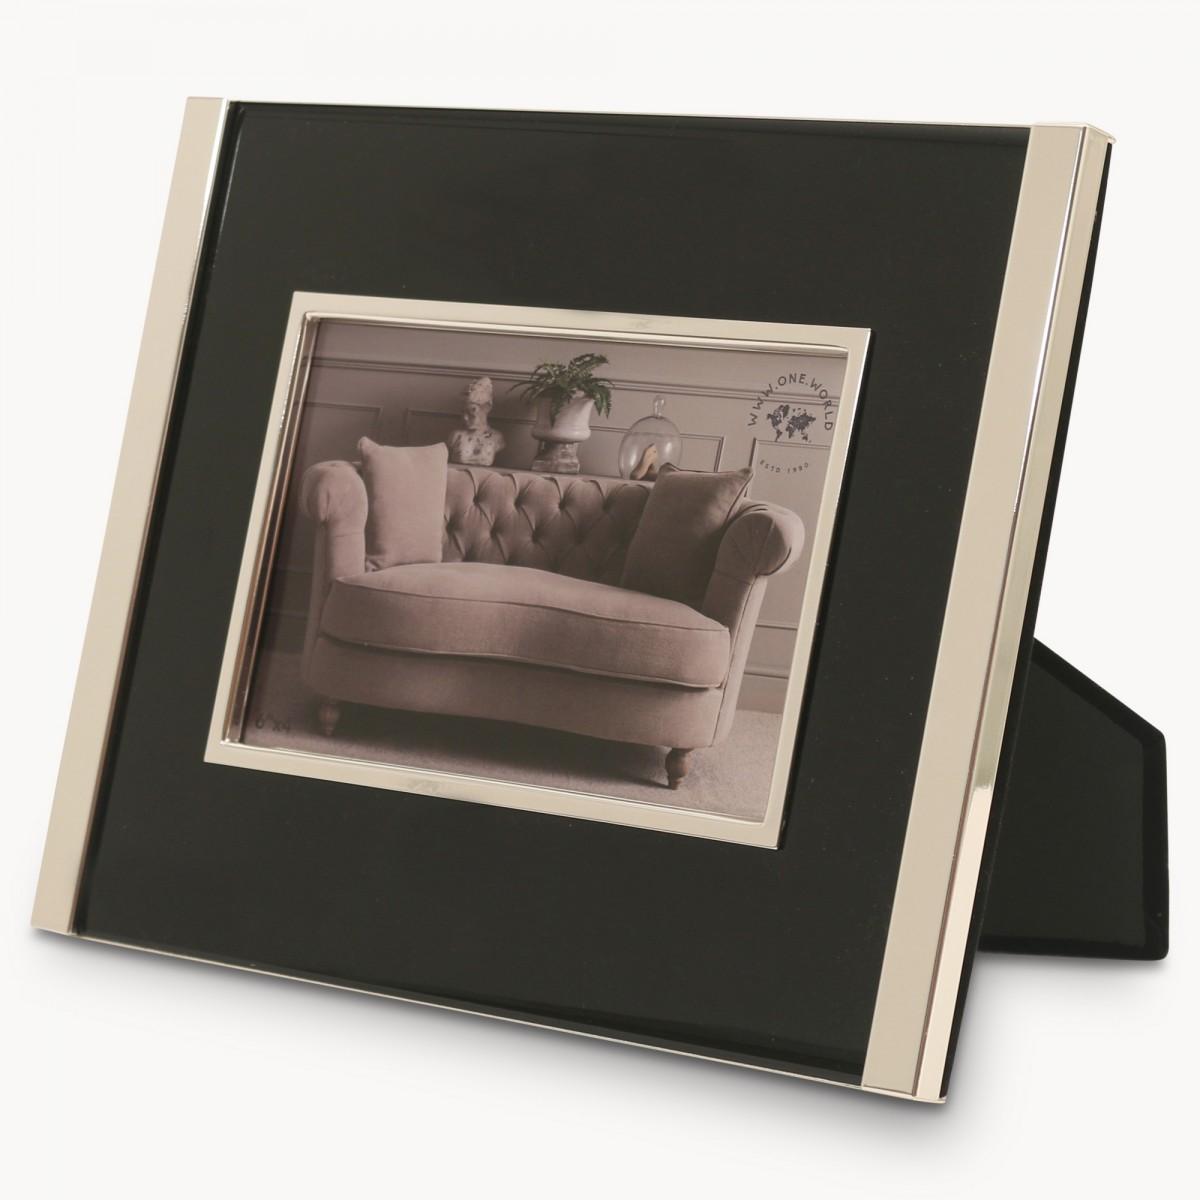 Ashgrove Chrome Photo Frame Black Inlay